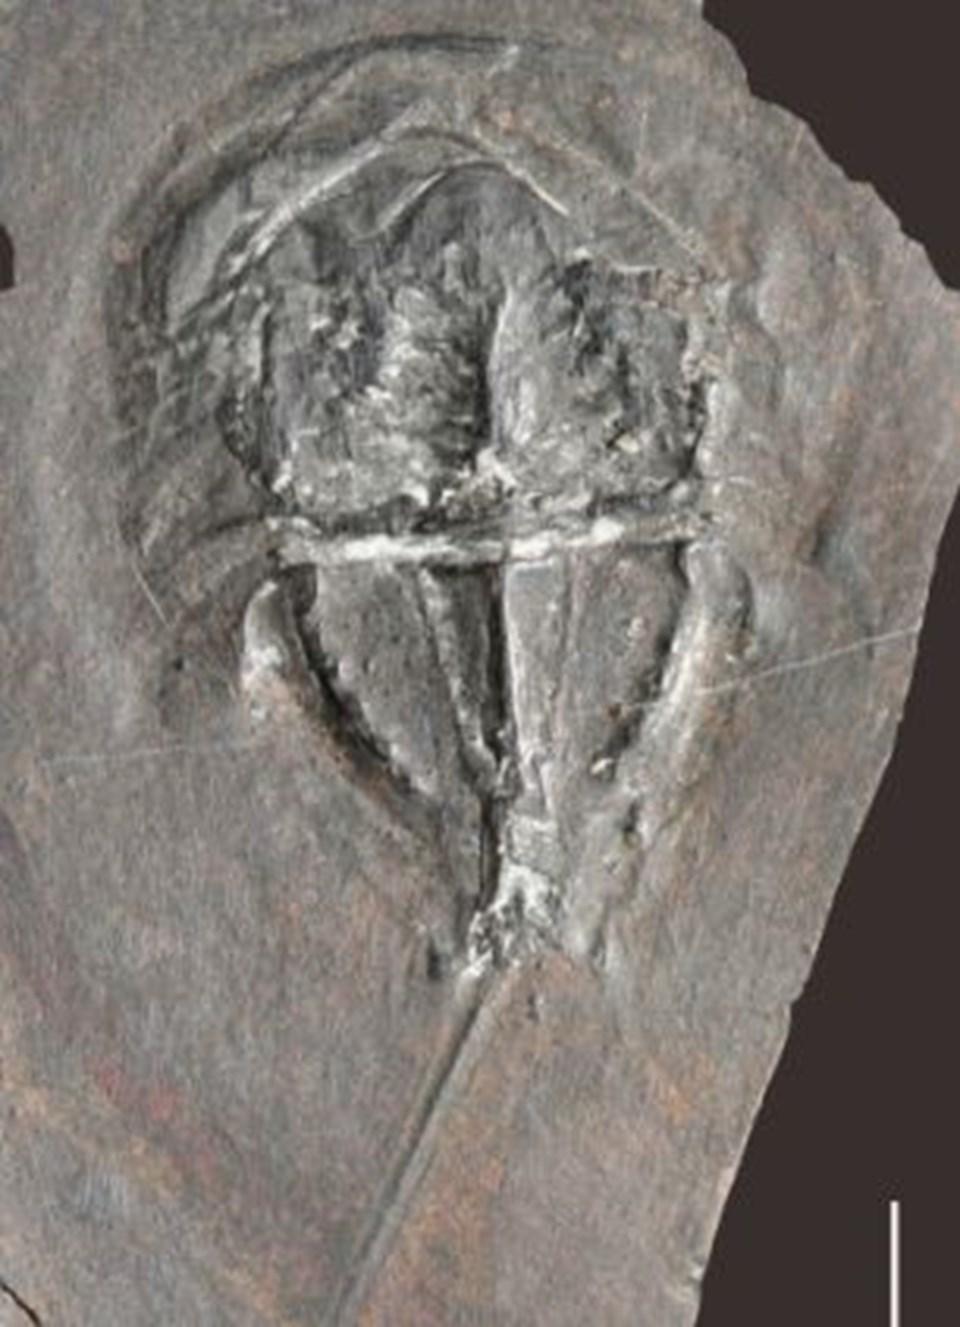 Atnalı yengeci fosili.